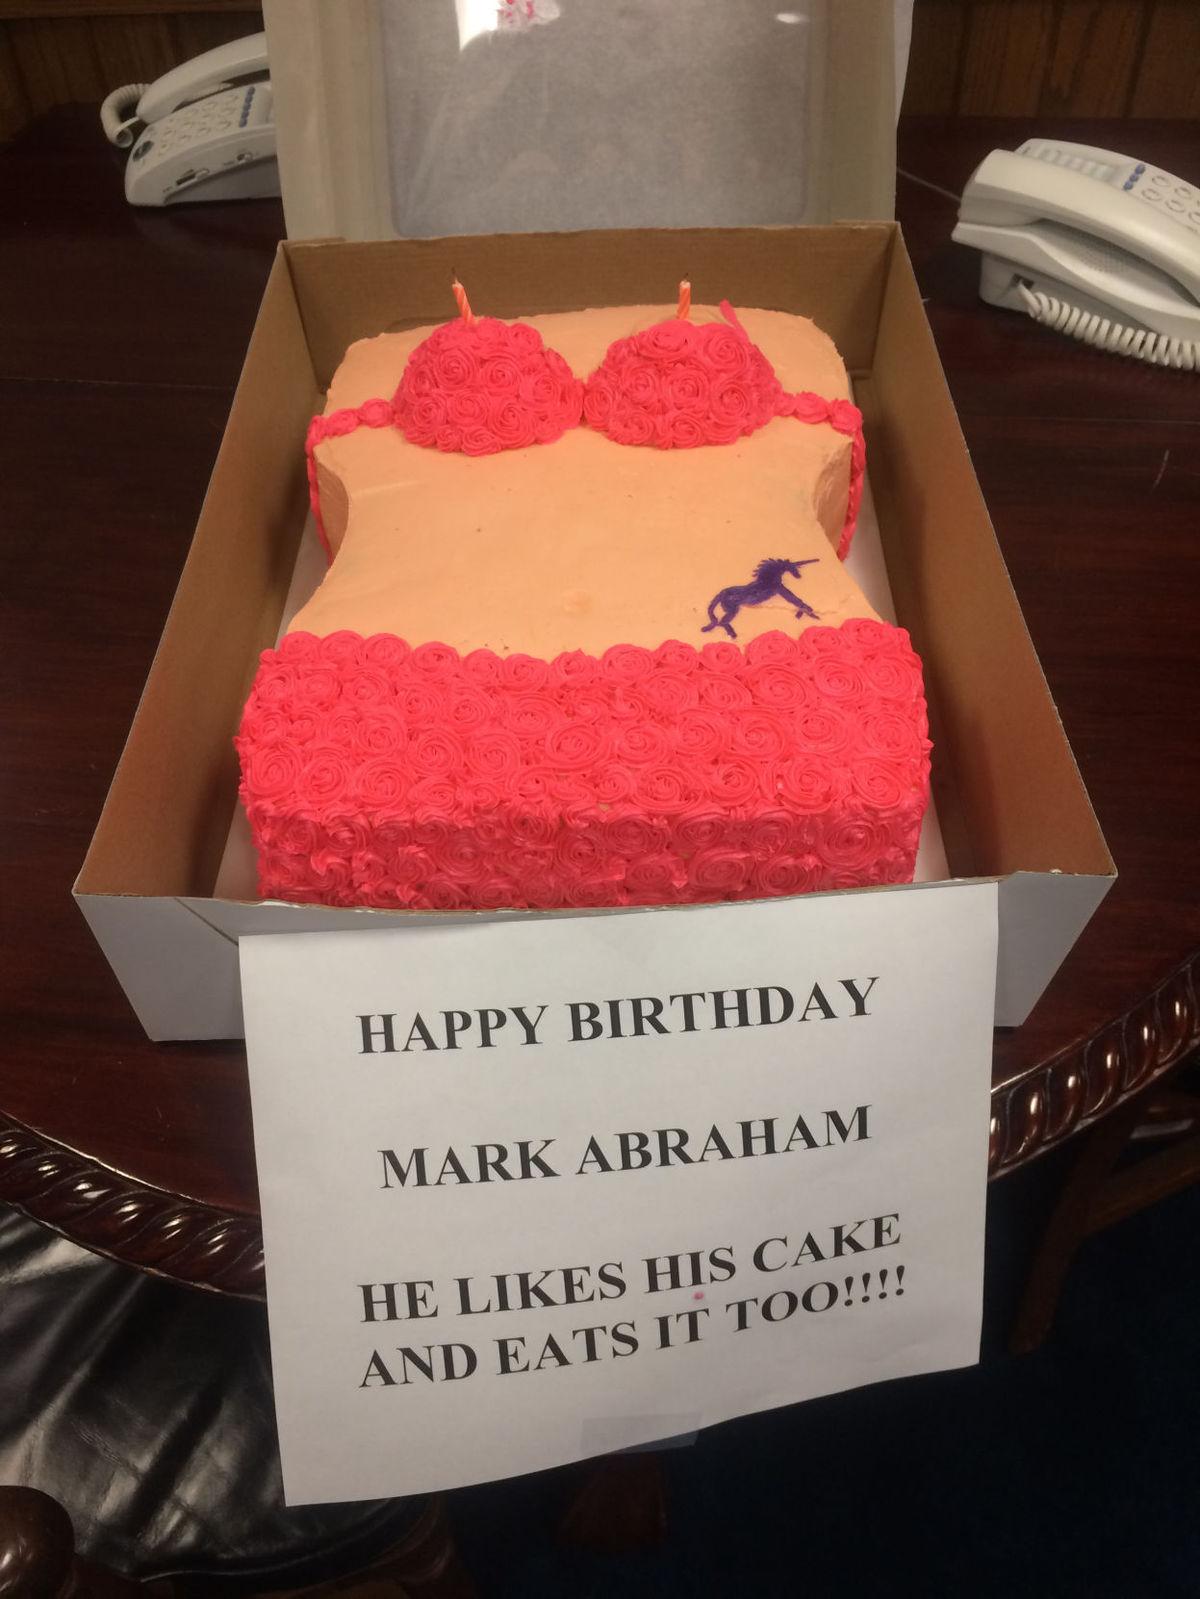 la lawmakers celebrate birthday with cakes in shape of bikini on birthday cakes new iberia la